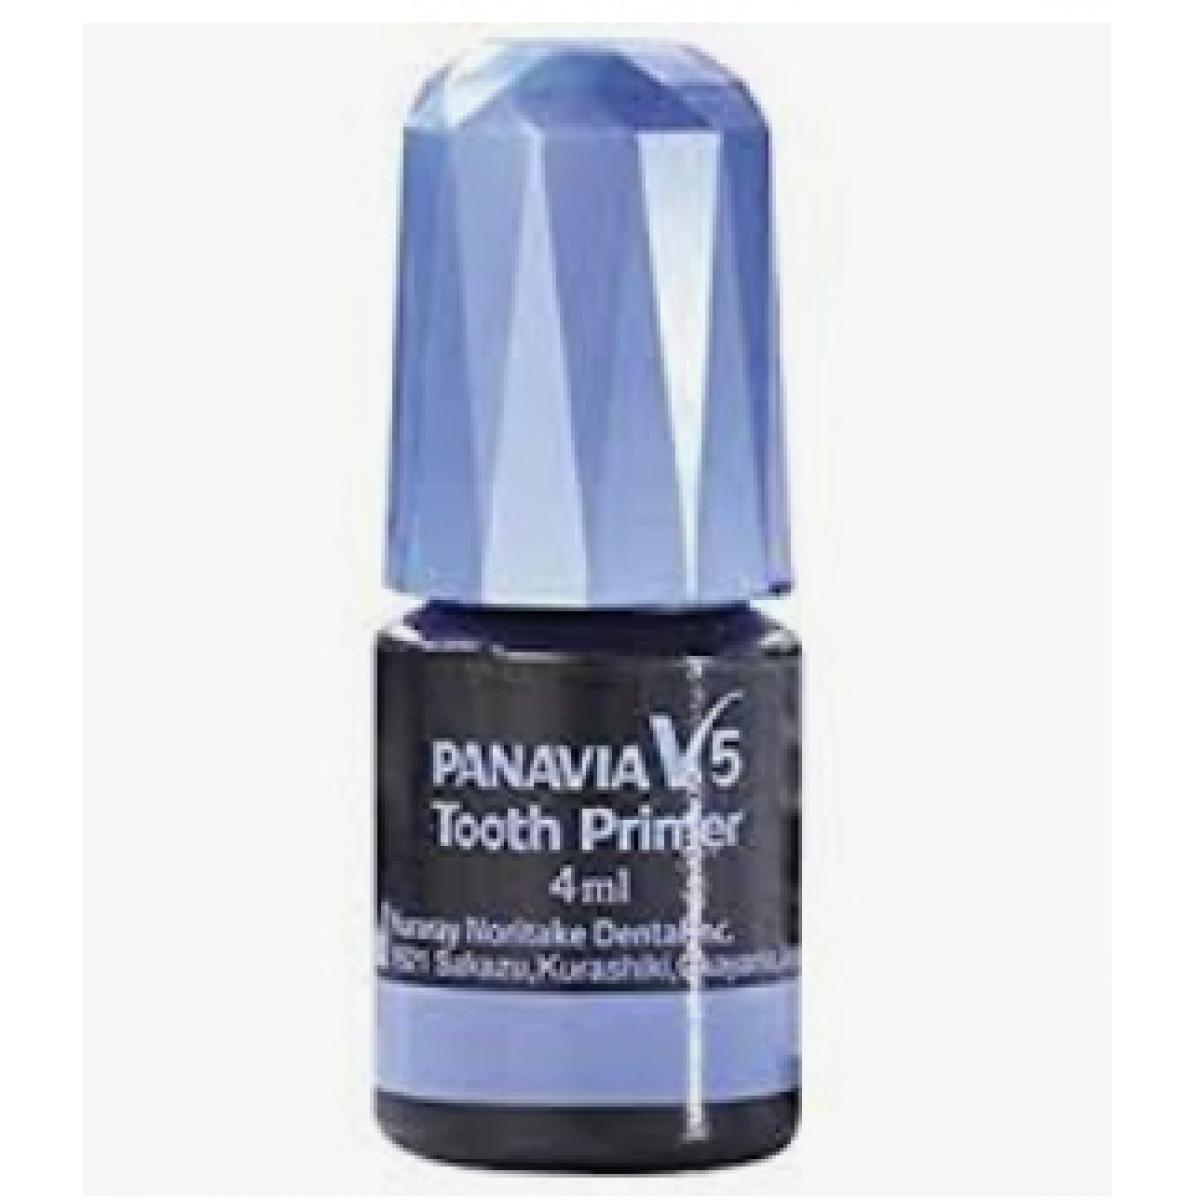 PANAVIA V5 TOOTH PRIMER 4 ML -